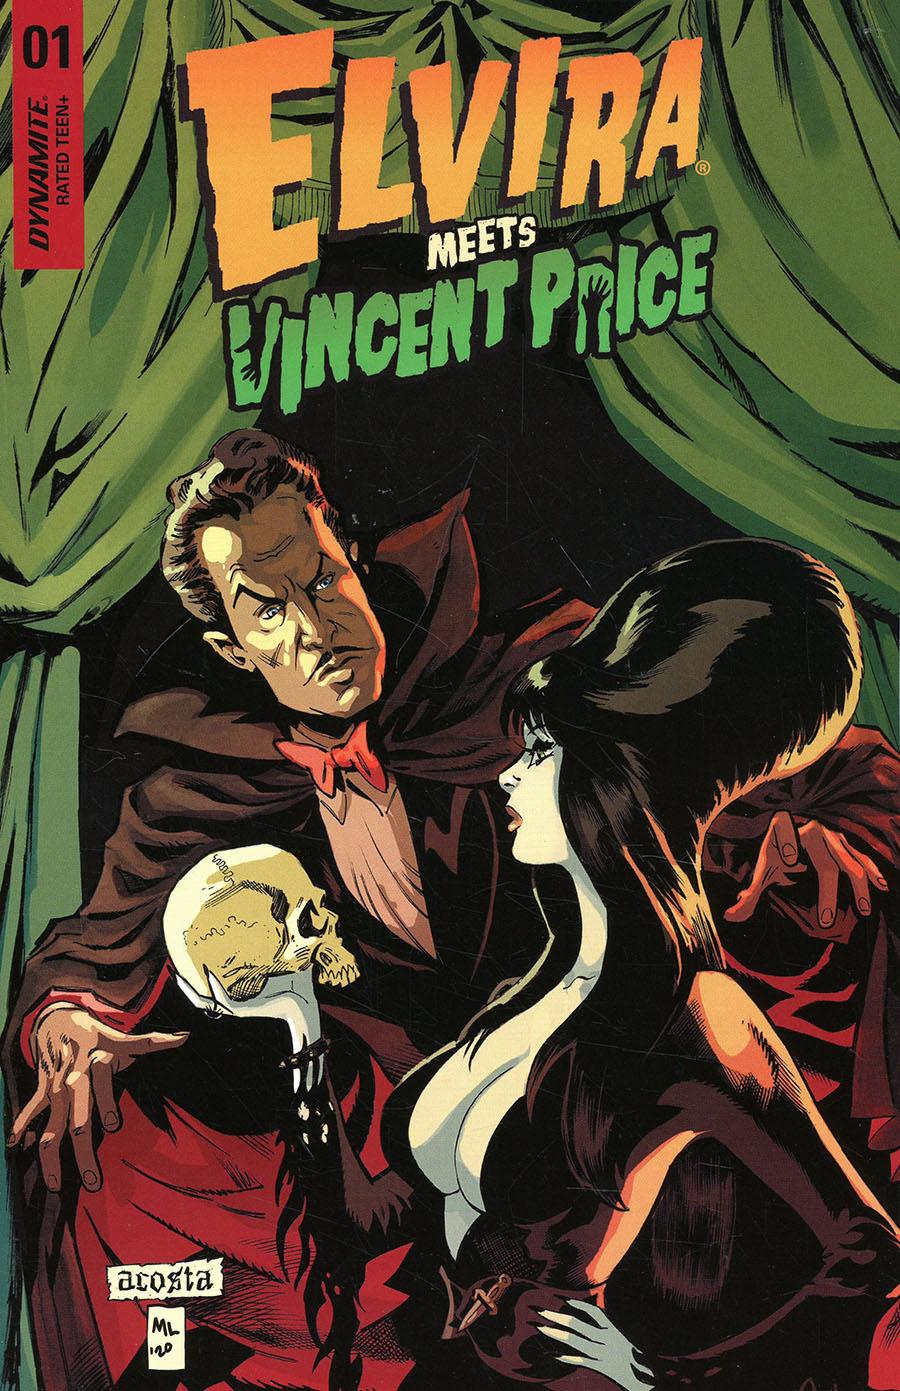 Elvira Meets Vincent Price #1 Cover A Regular Dave Acosta Cover